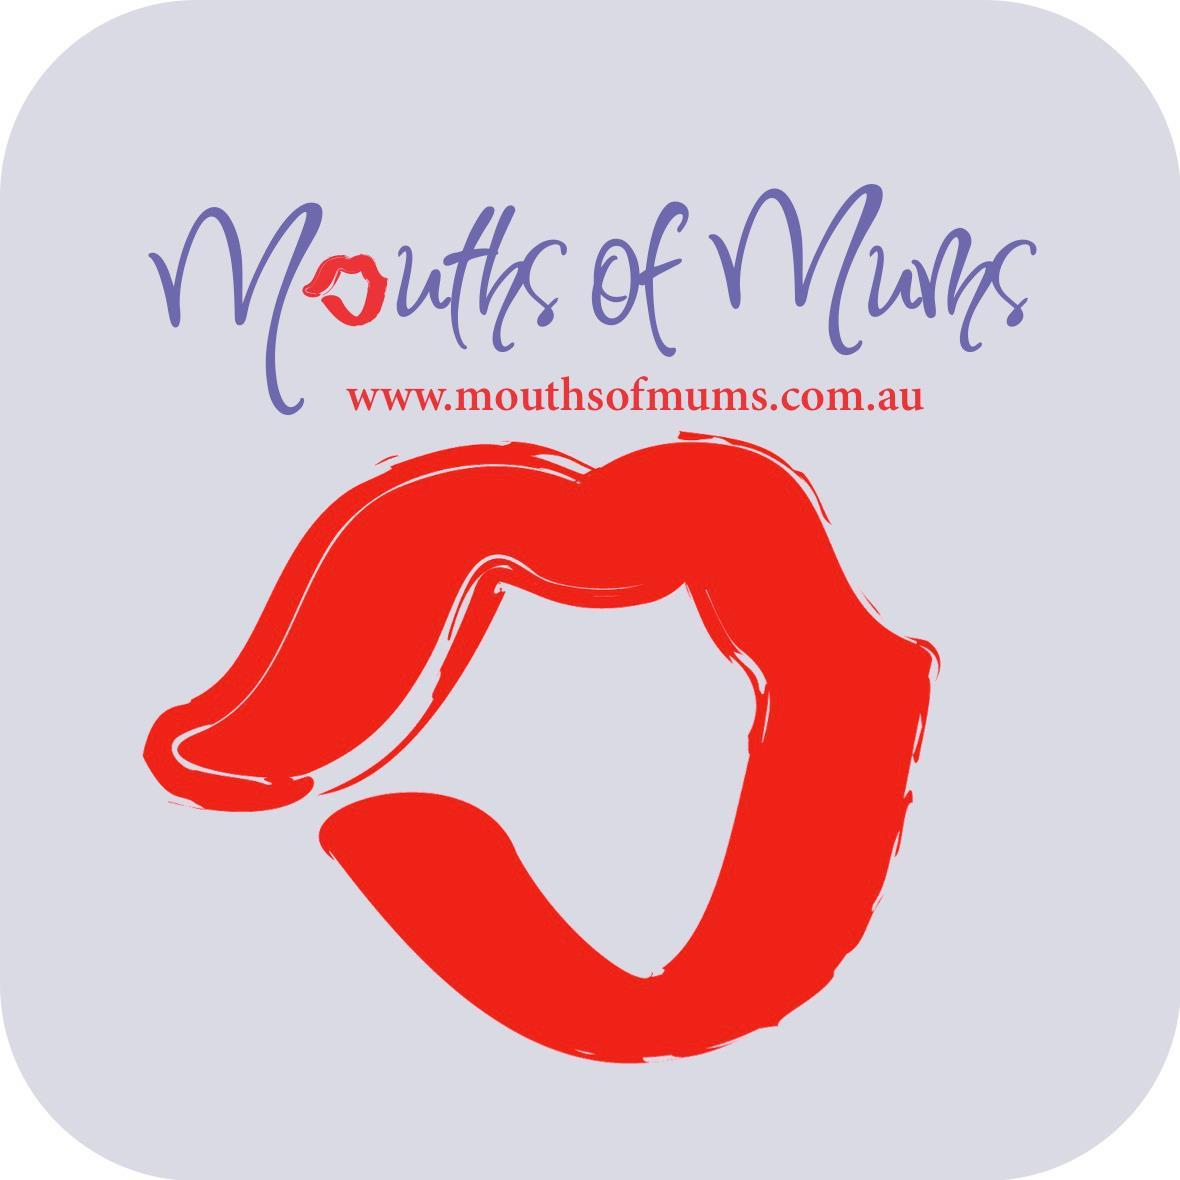 Mouths of Mums ROCKS!